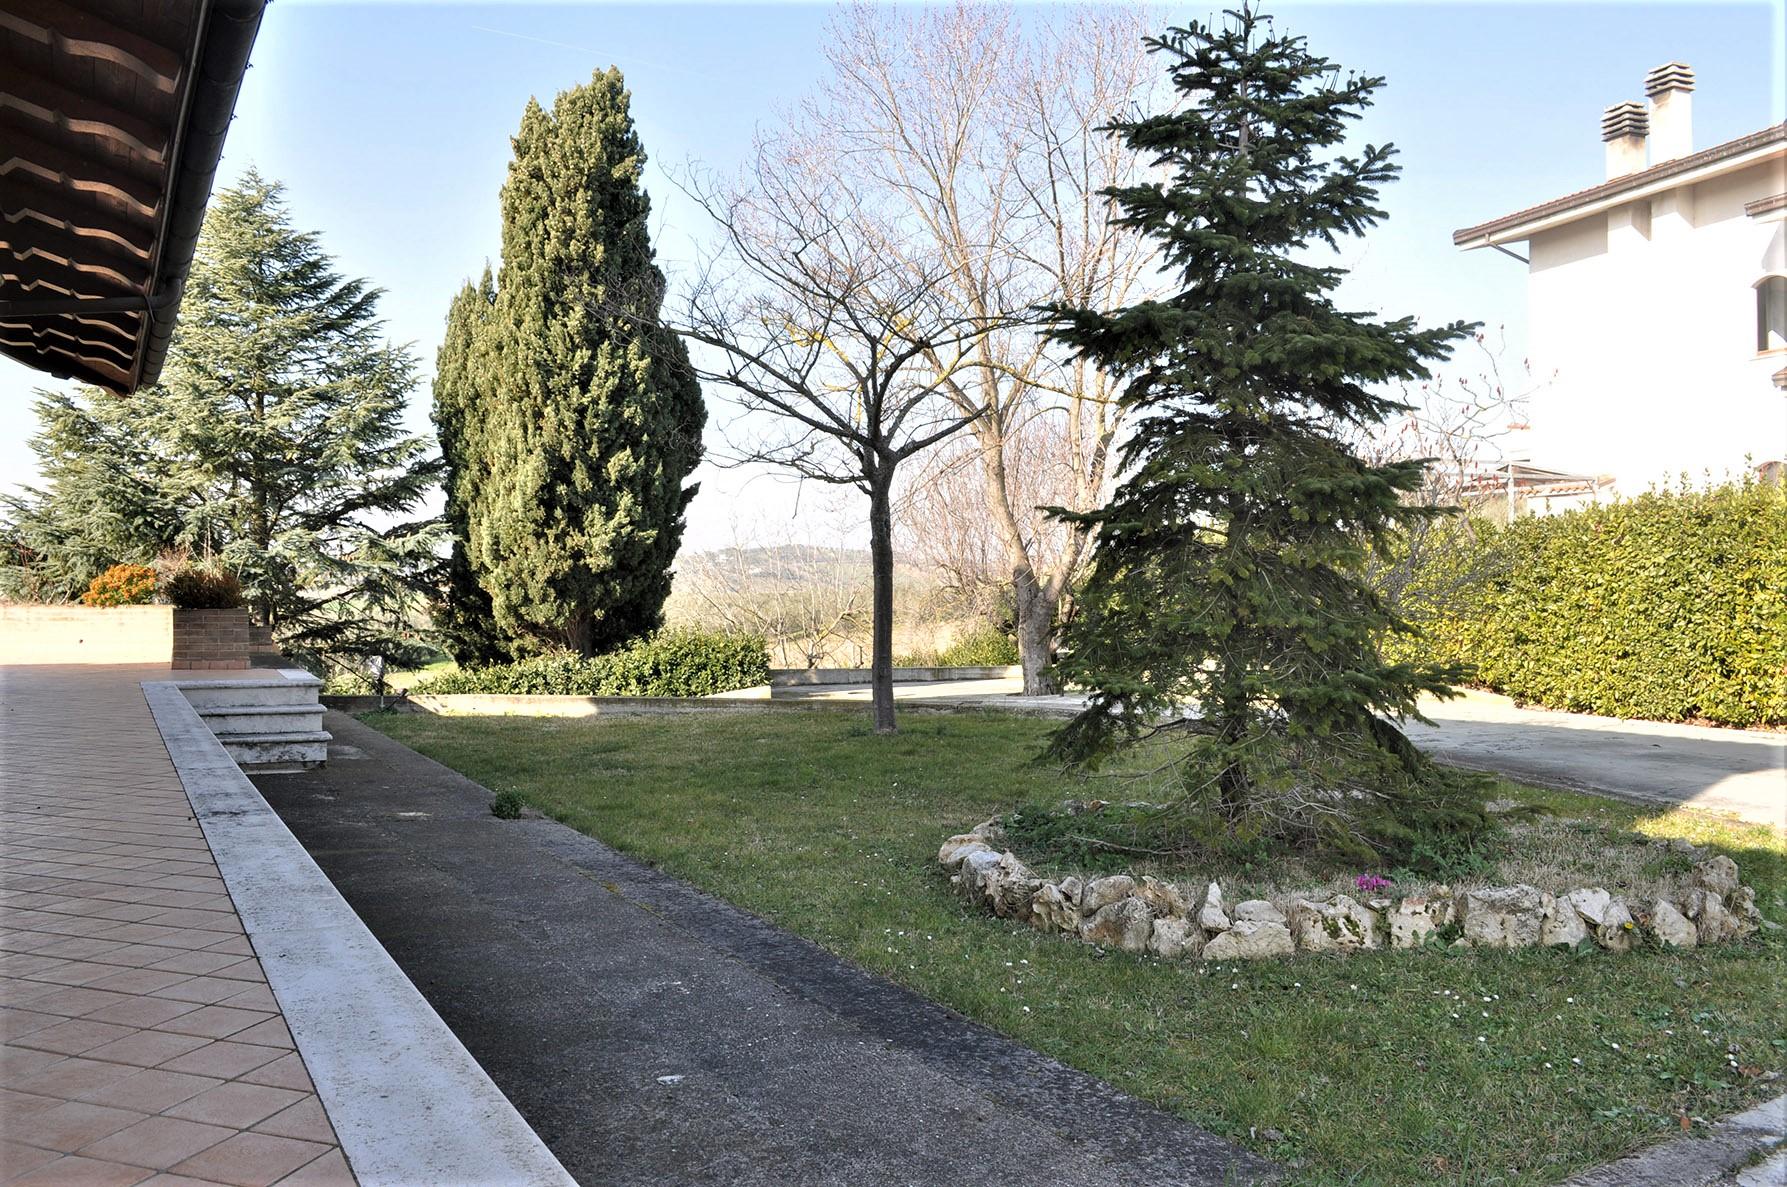 Villa Villa for sale Tortoreto (TE), Villa Bianca - Tortoreto - EUR 770.233 450